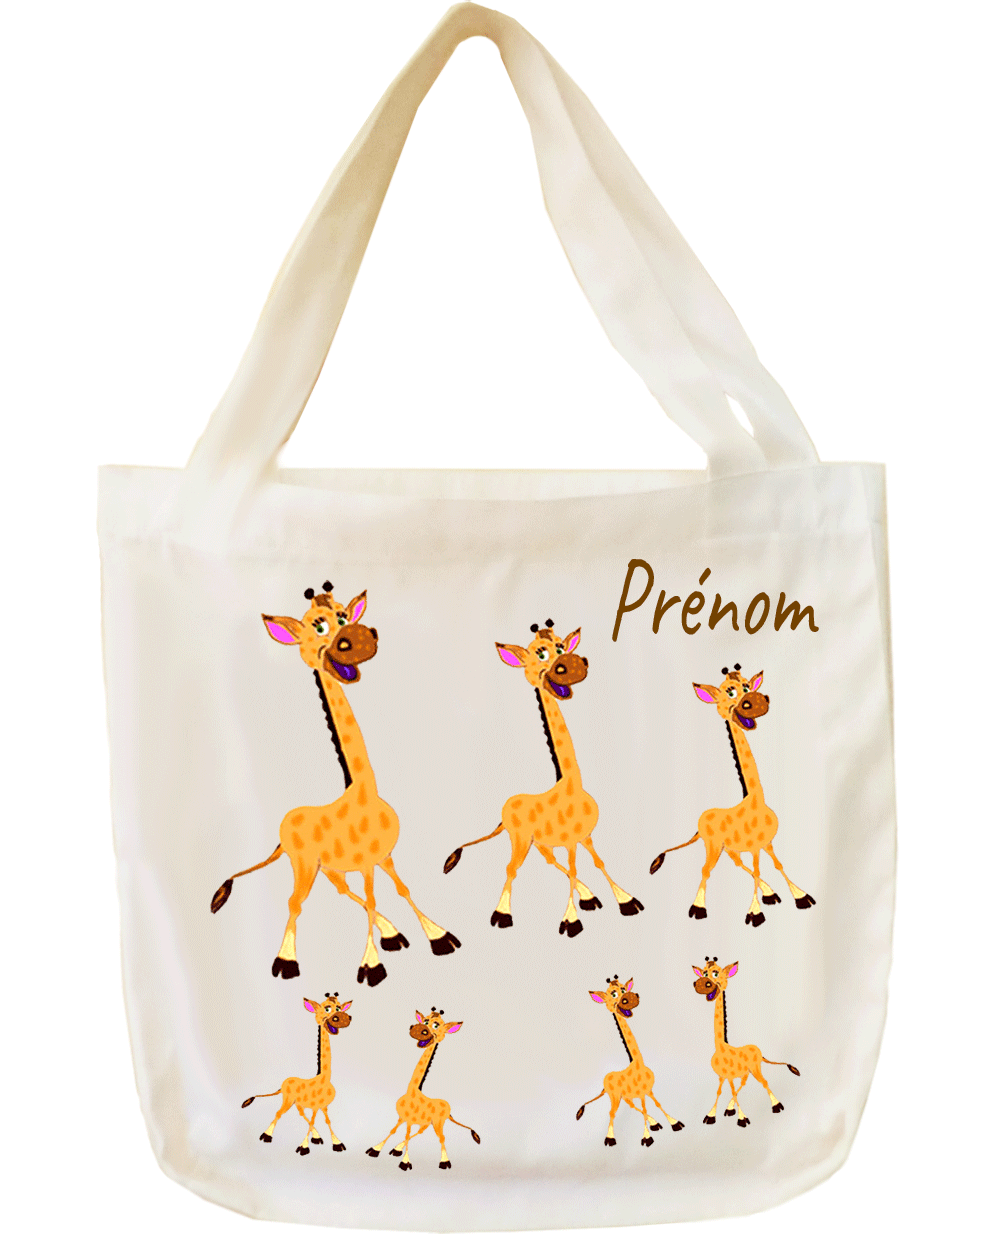 tote-bag;sac;cabas;texti;cadeaux;personnalisable;personnalisation;personnalise;prenom;animal;girafe